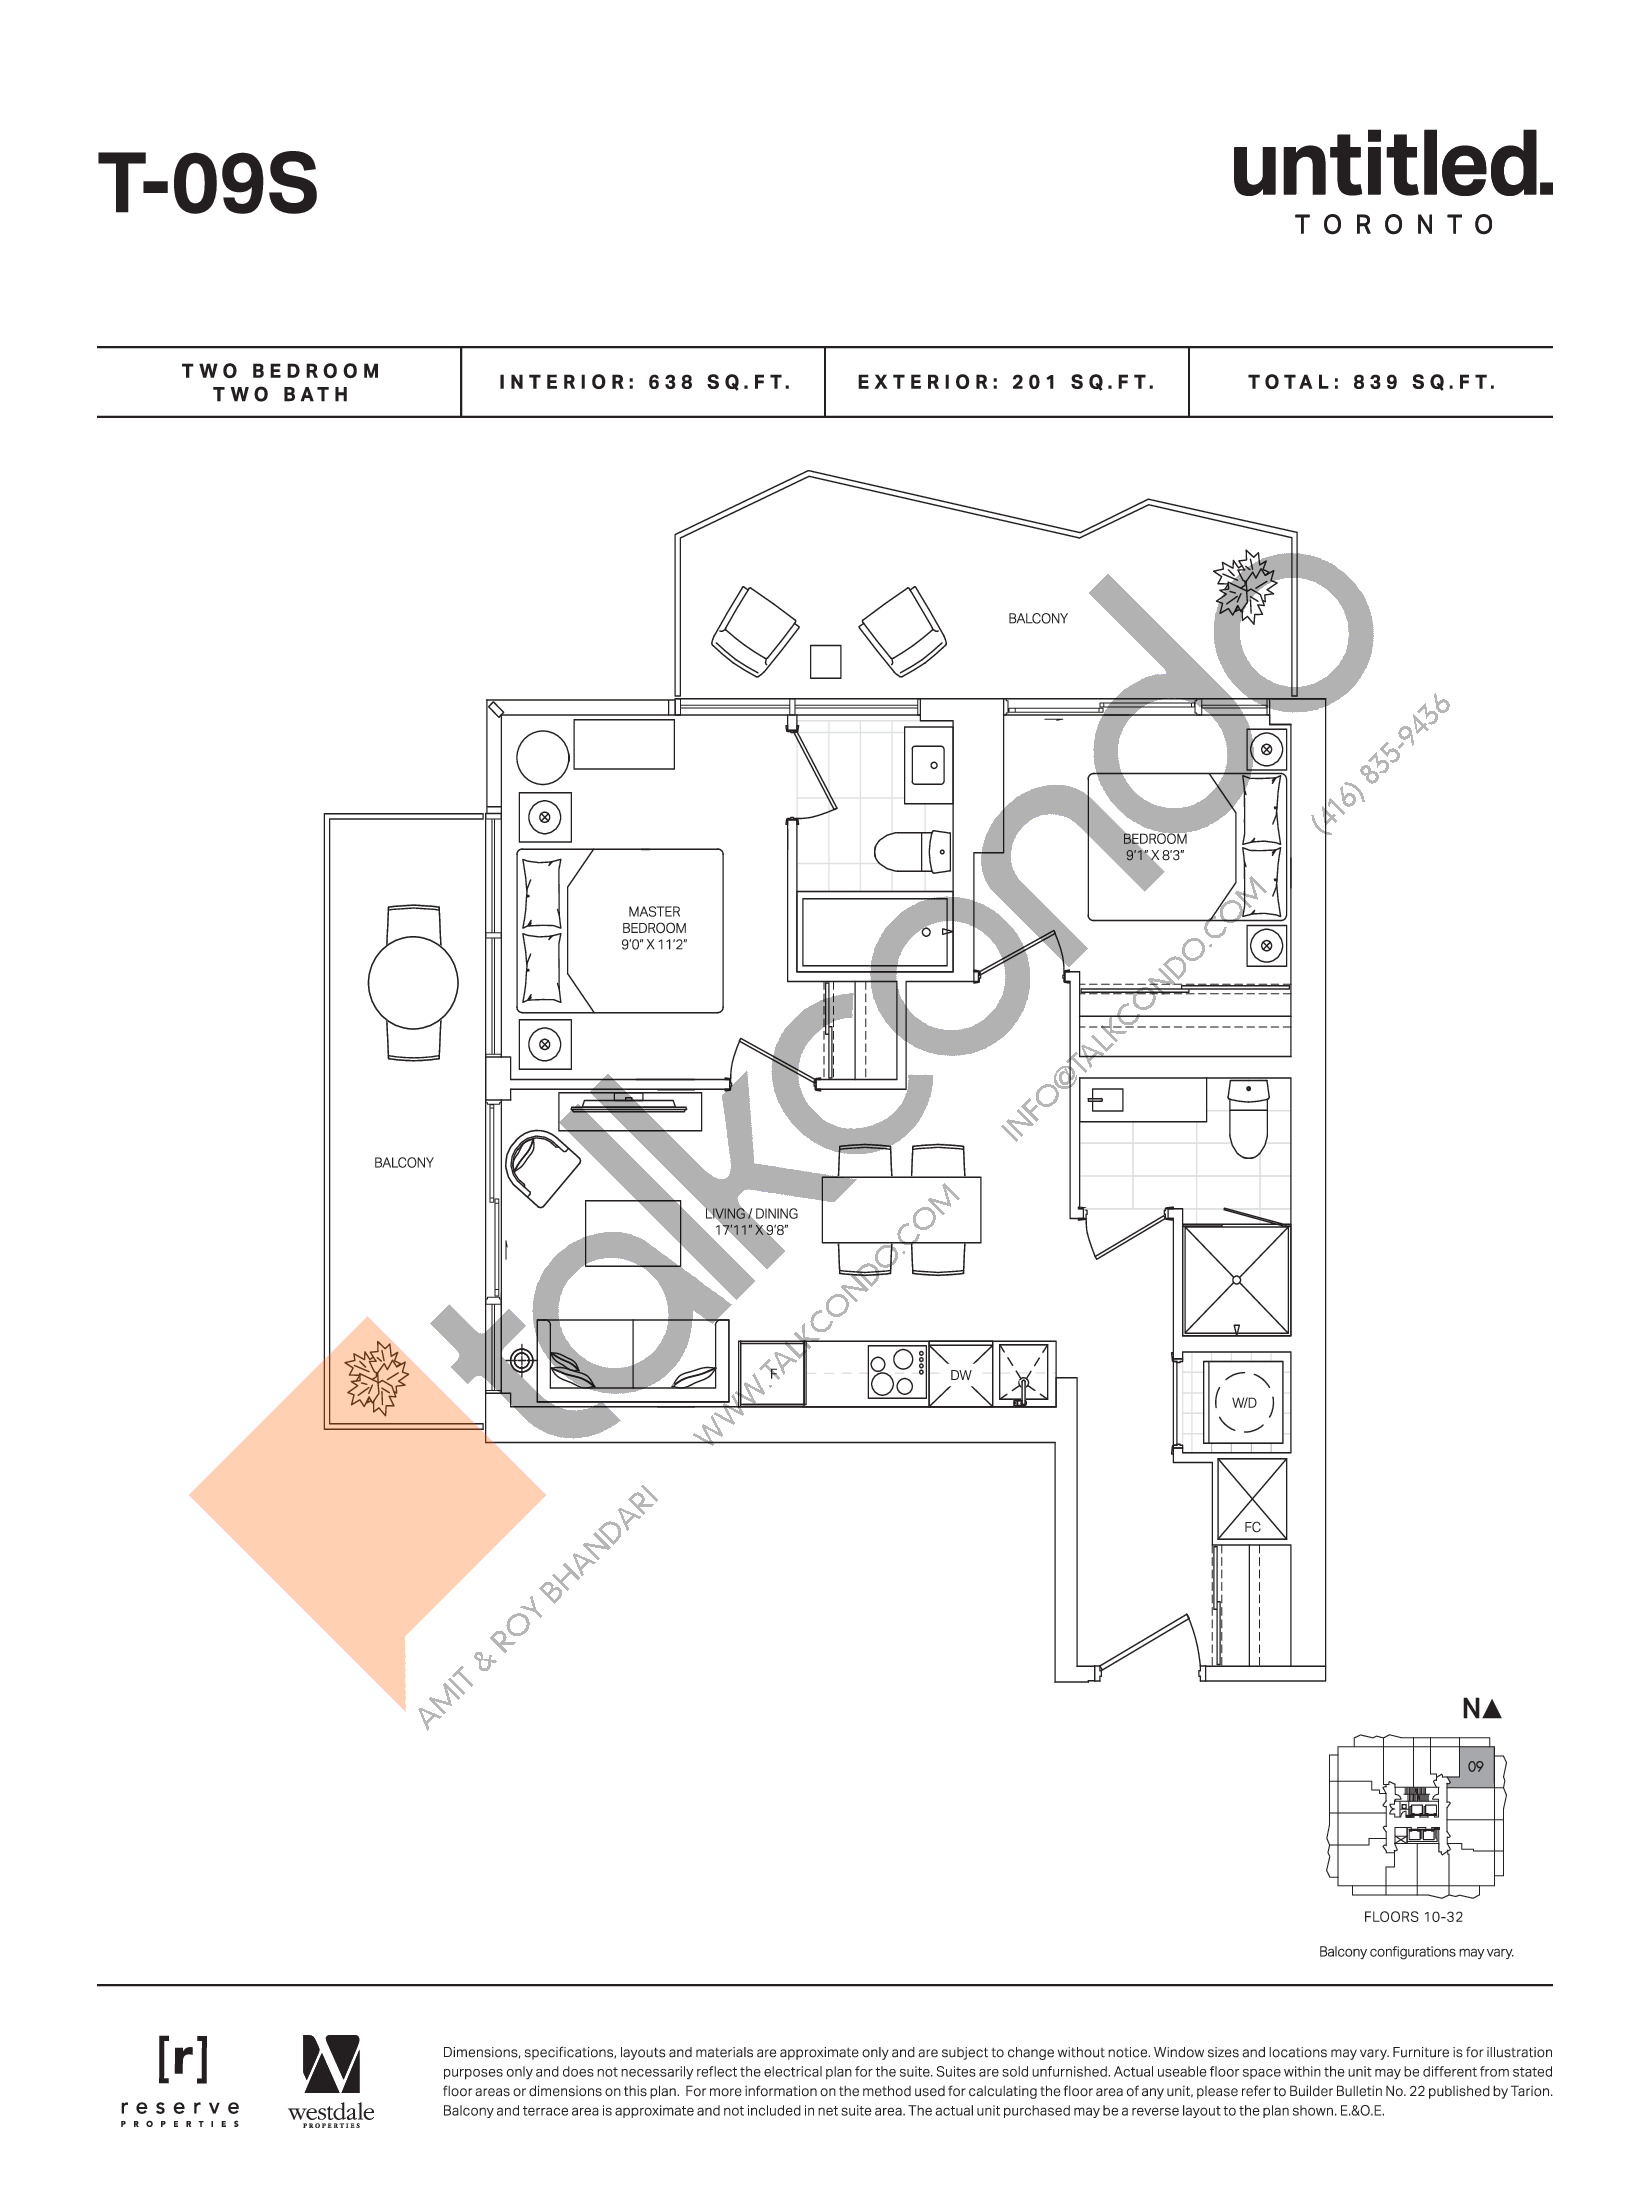 T-09S Floor Plan at Untitled Toronto Condos - 638 sq.ft